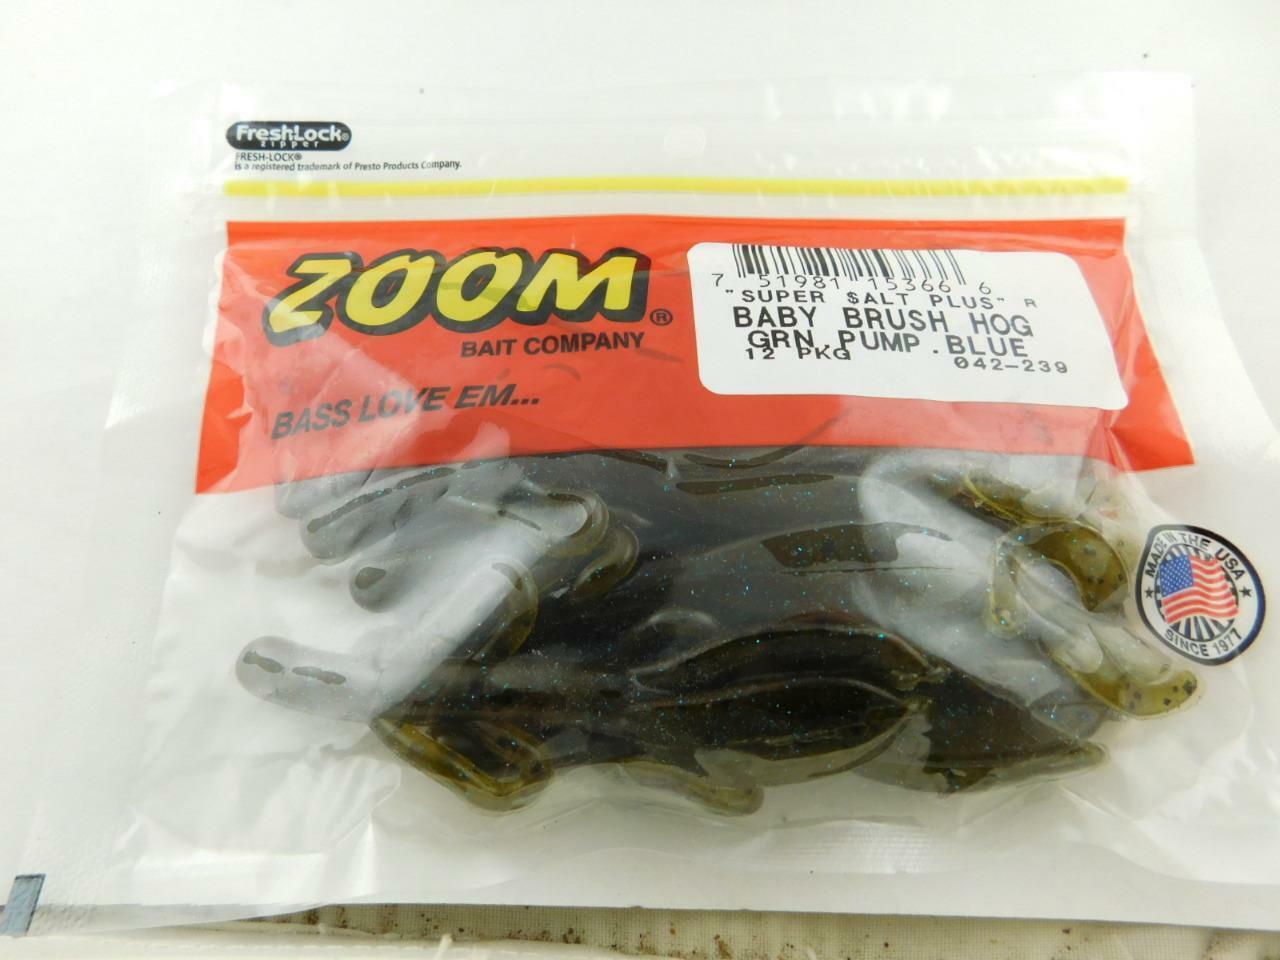 Zoom 042-216 Baby Brush Hog Watermelon Green Orange 042216 for sale online